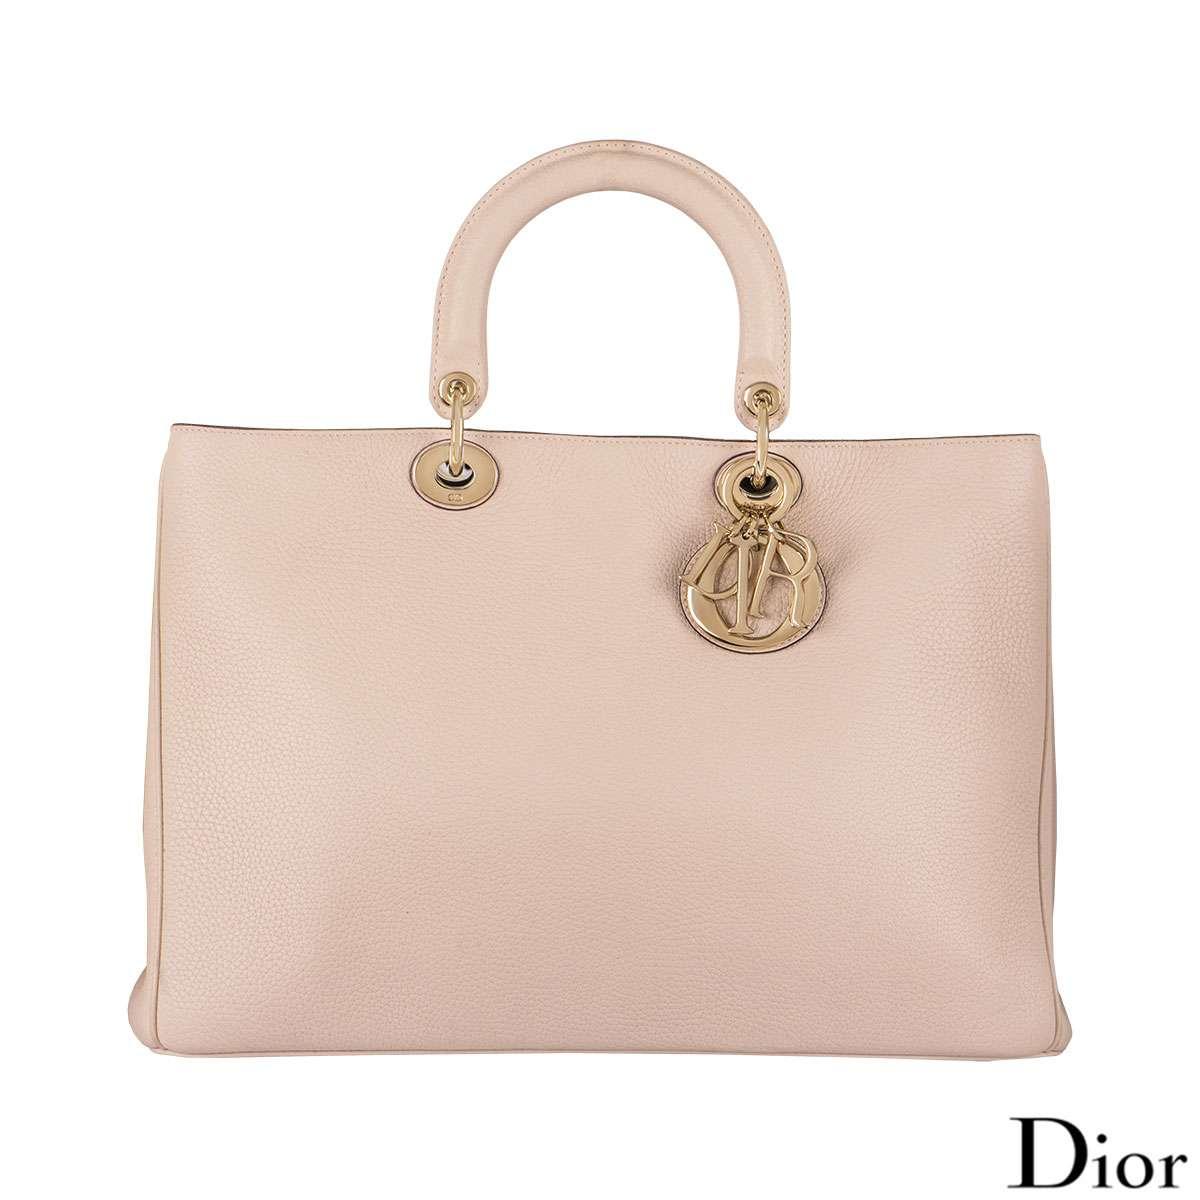 Christian Dior Pink Diorissimo Tote Bag